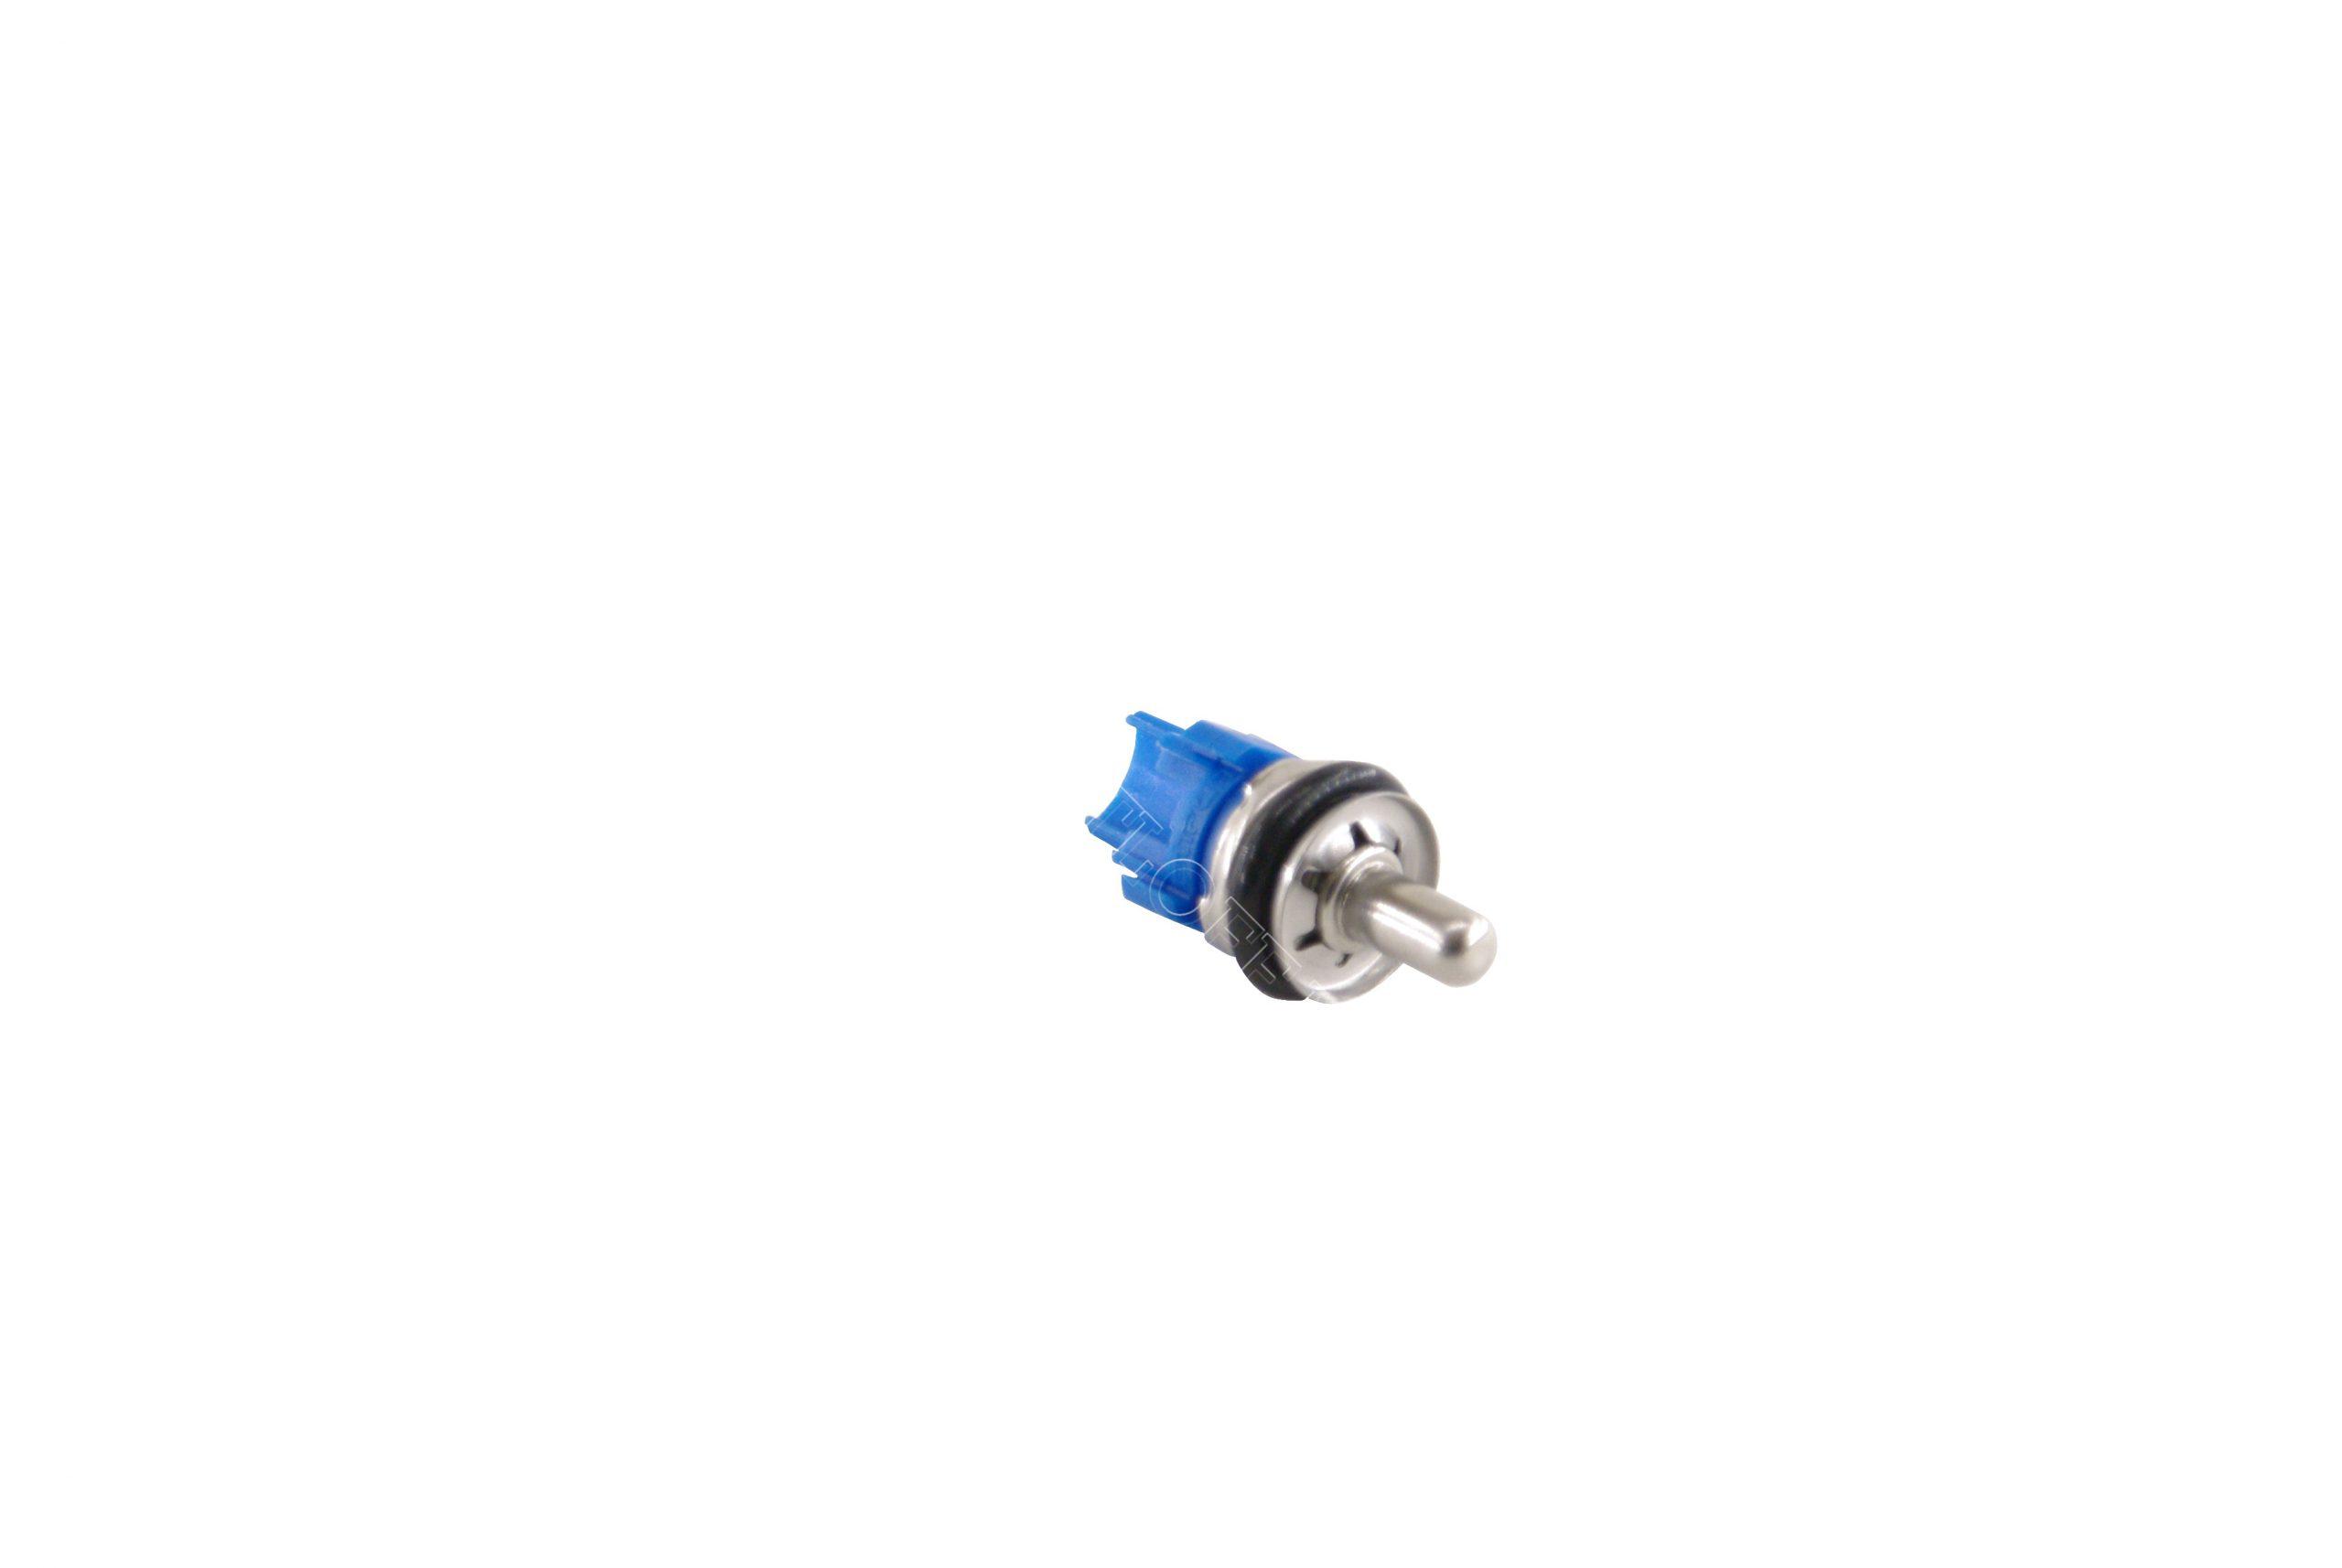 Датчик температуры ntc Bosch-Buderus 87186445820